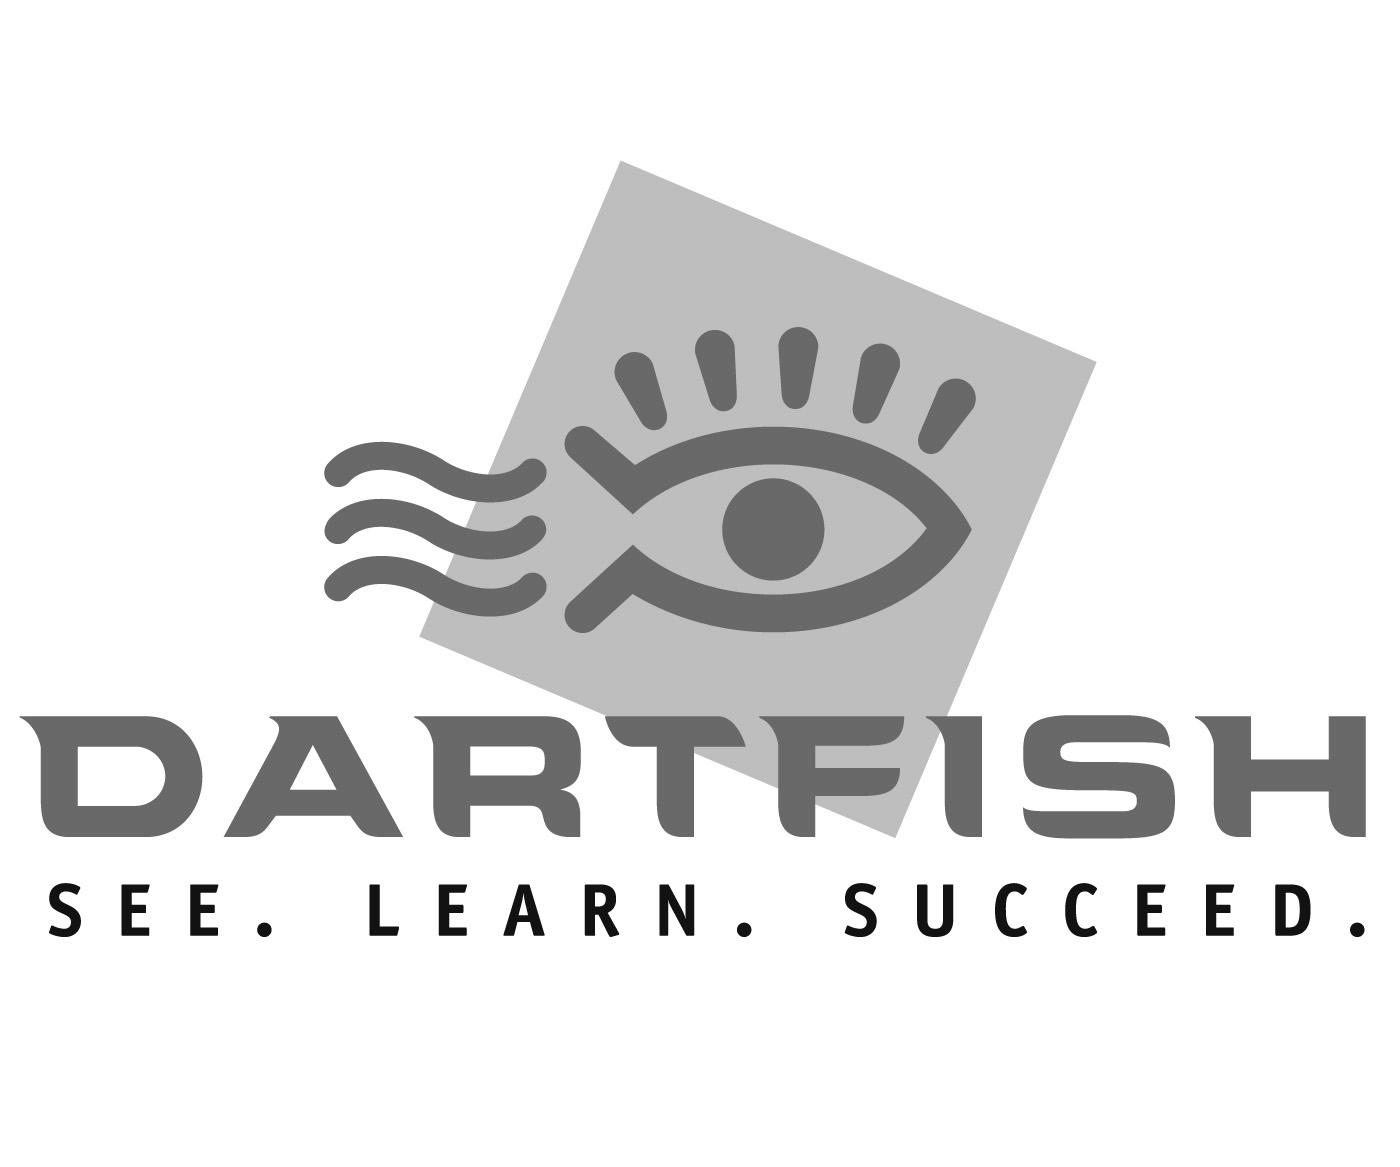 Dartfish-Logo1.jpg